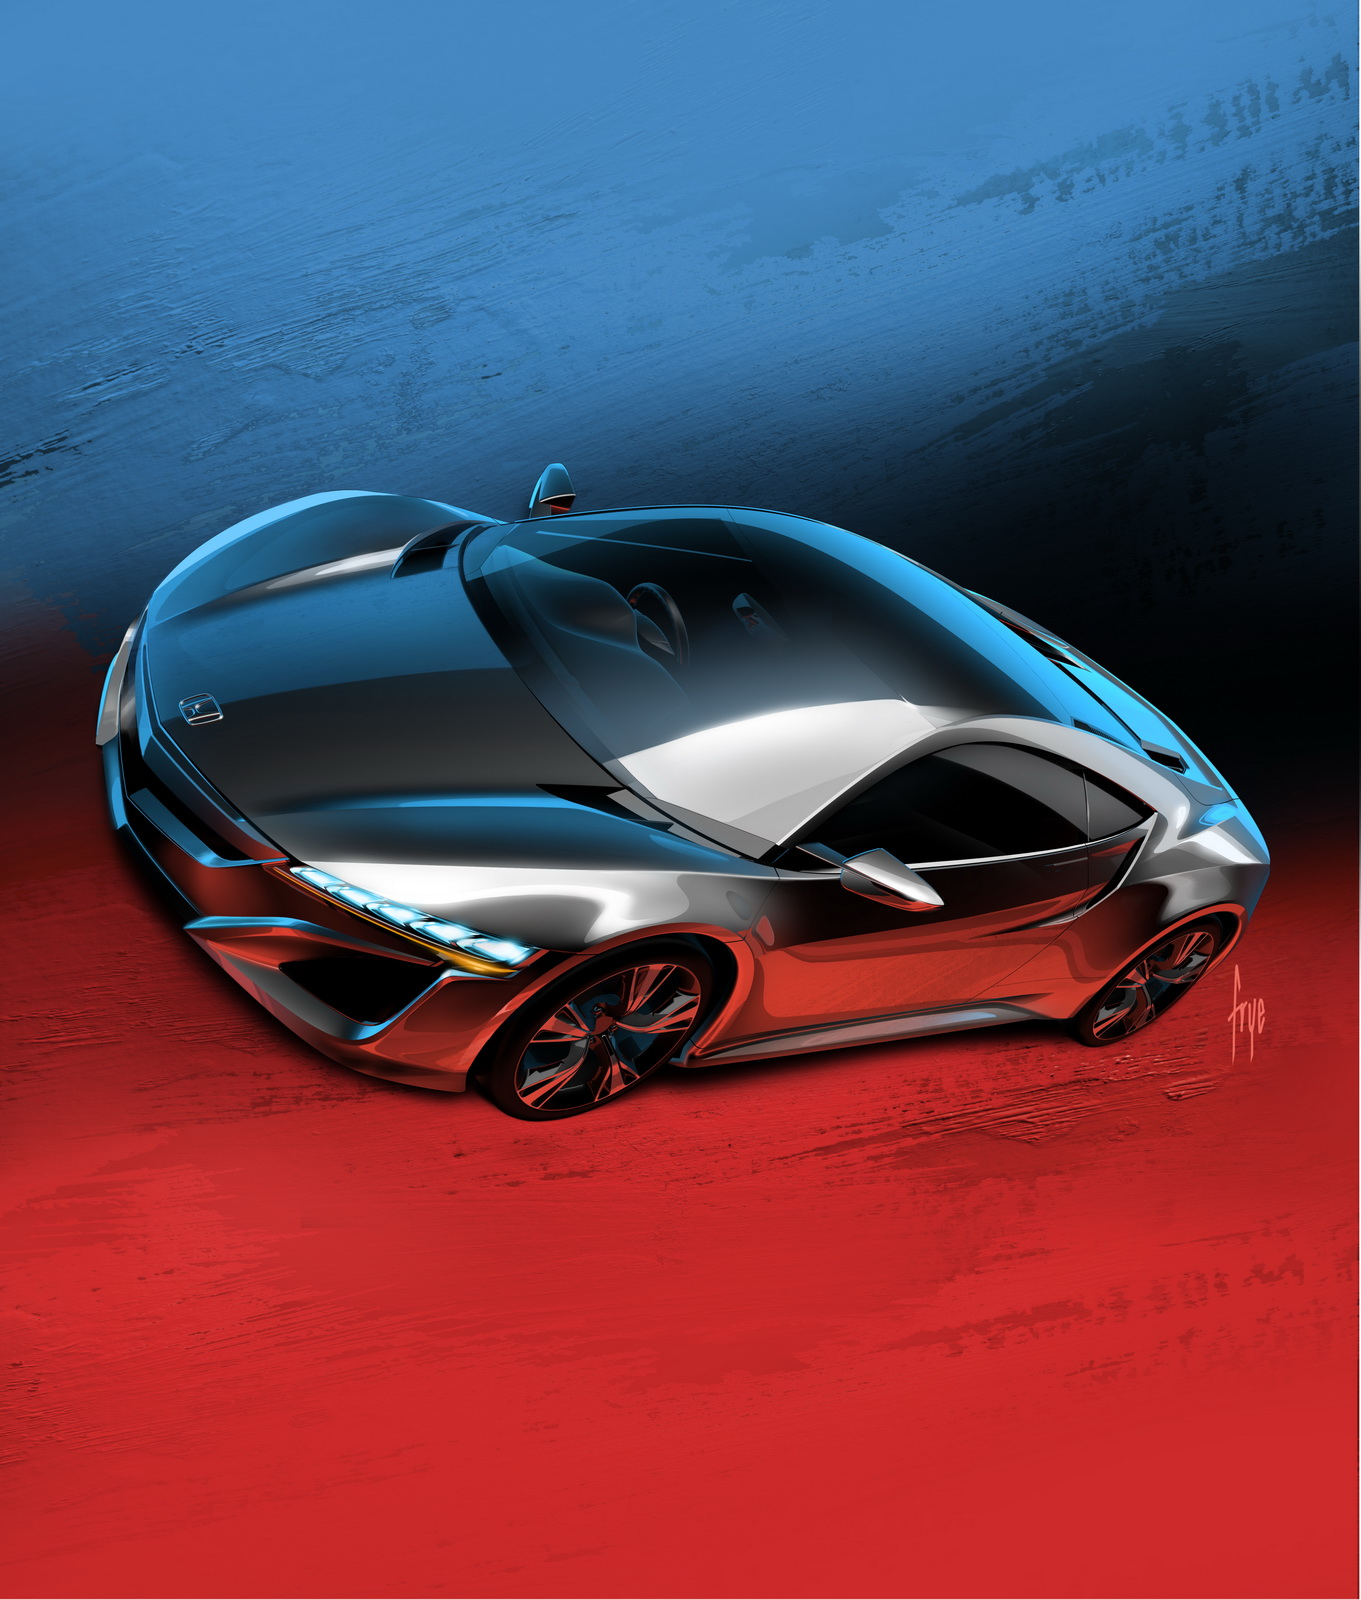 Honda NSX Concept And European CR-V Prototype Take Centre